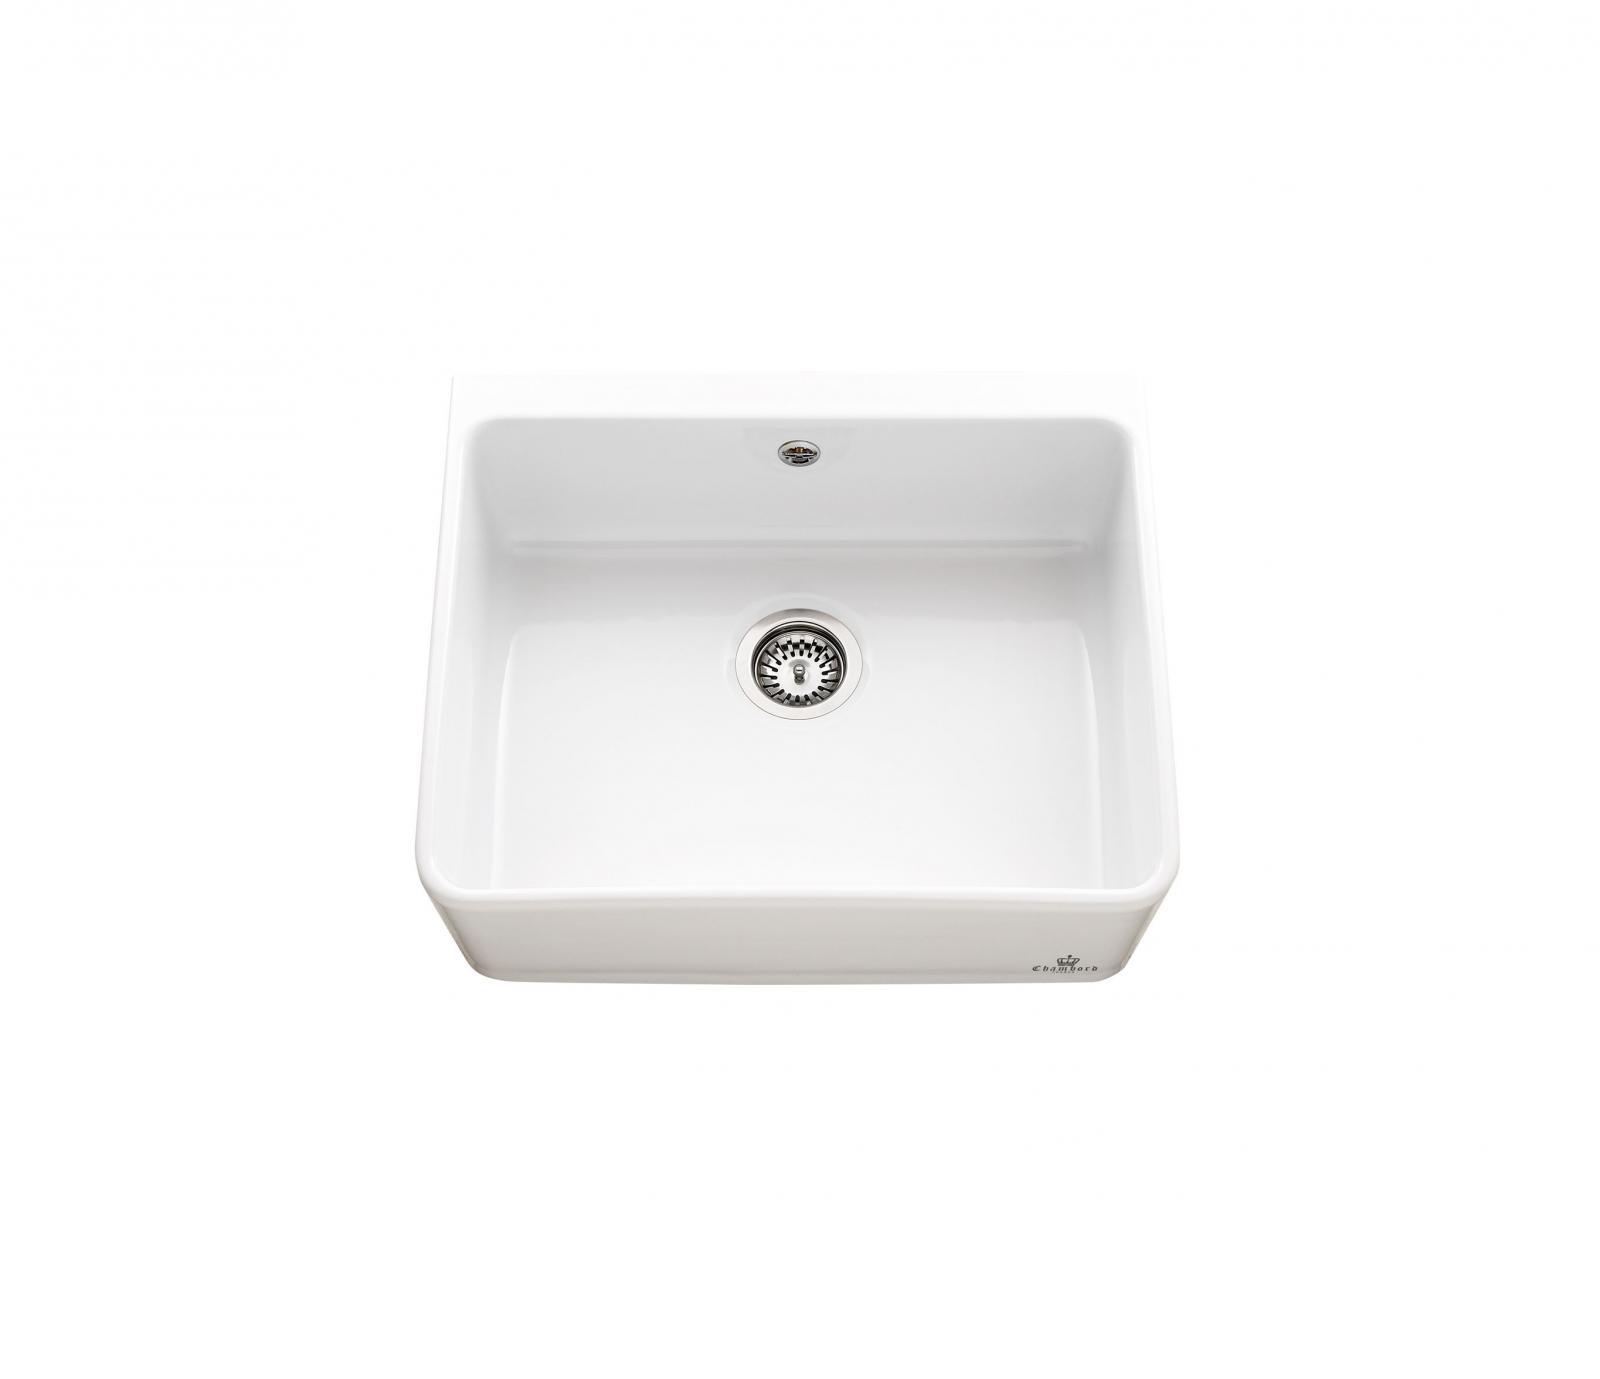 High-quality sink Clotaire I - single bowl, ceramic